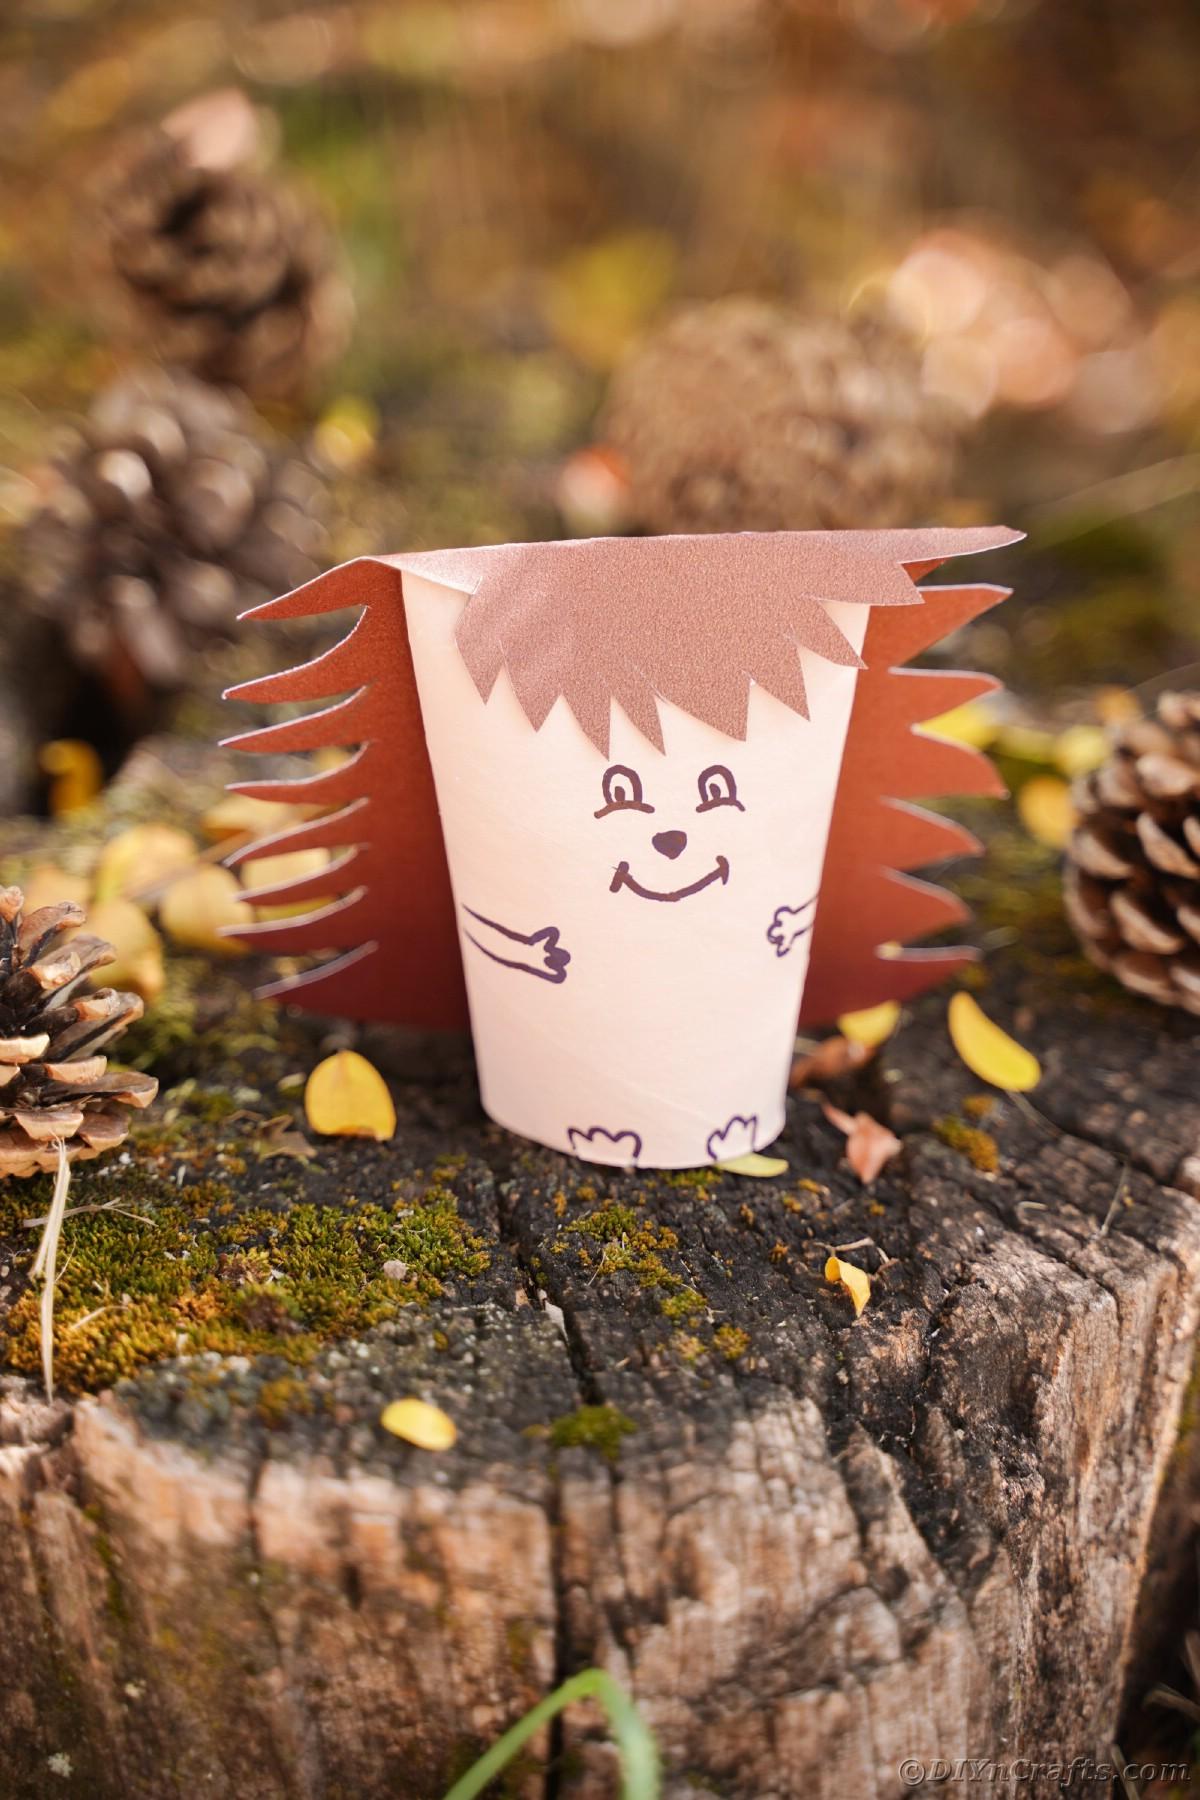 Paper hedgehog sitting on stump by pinecones